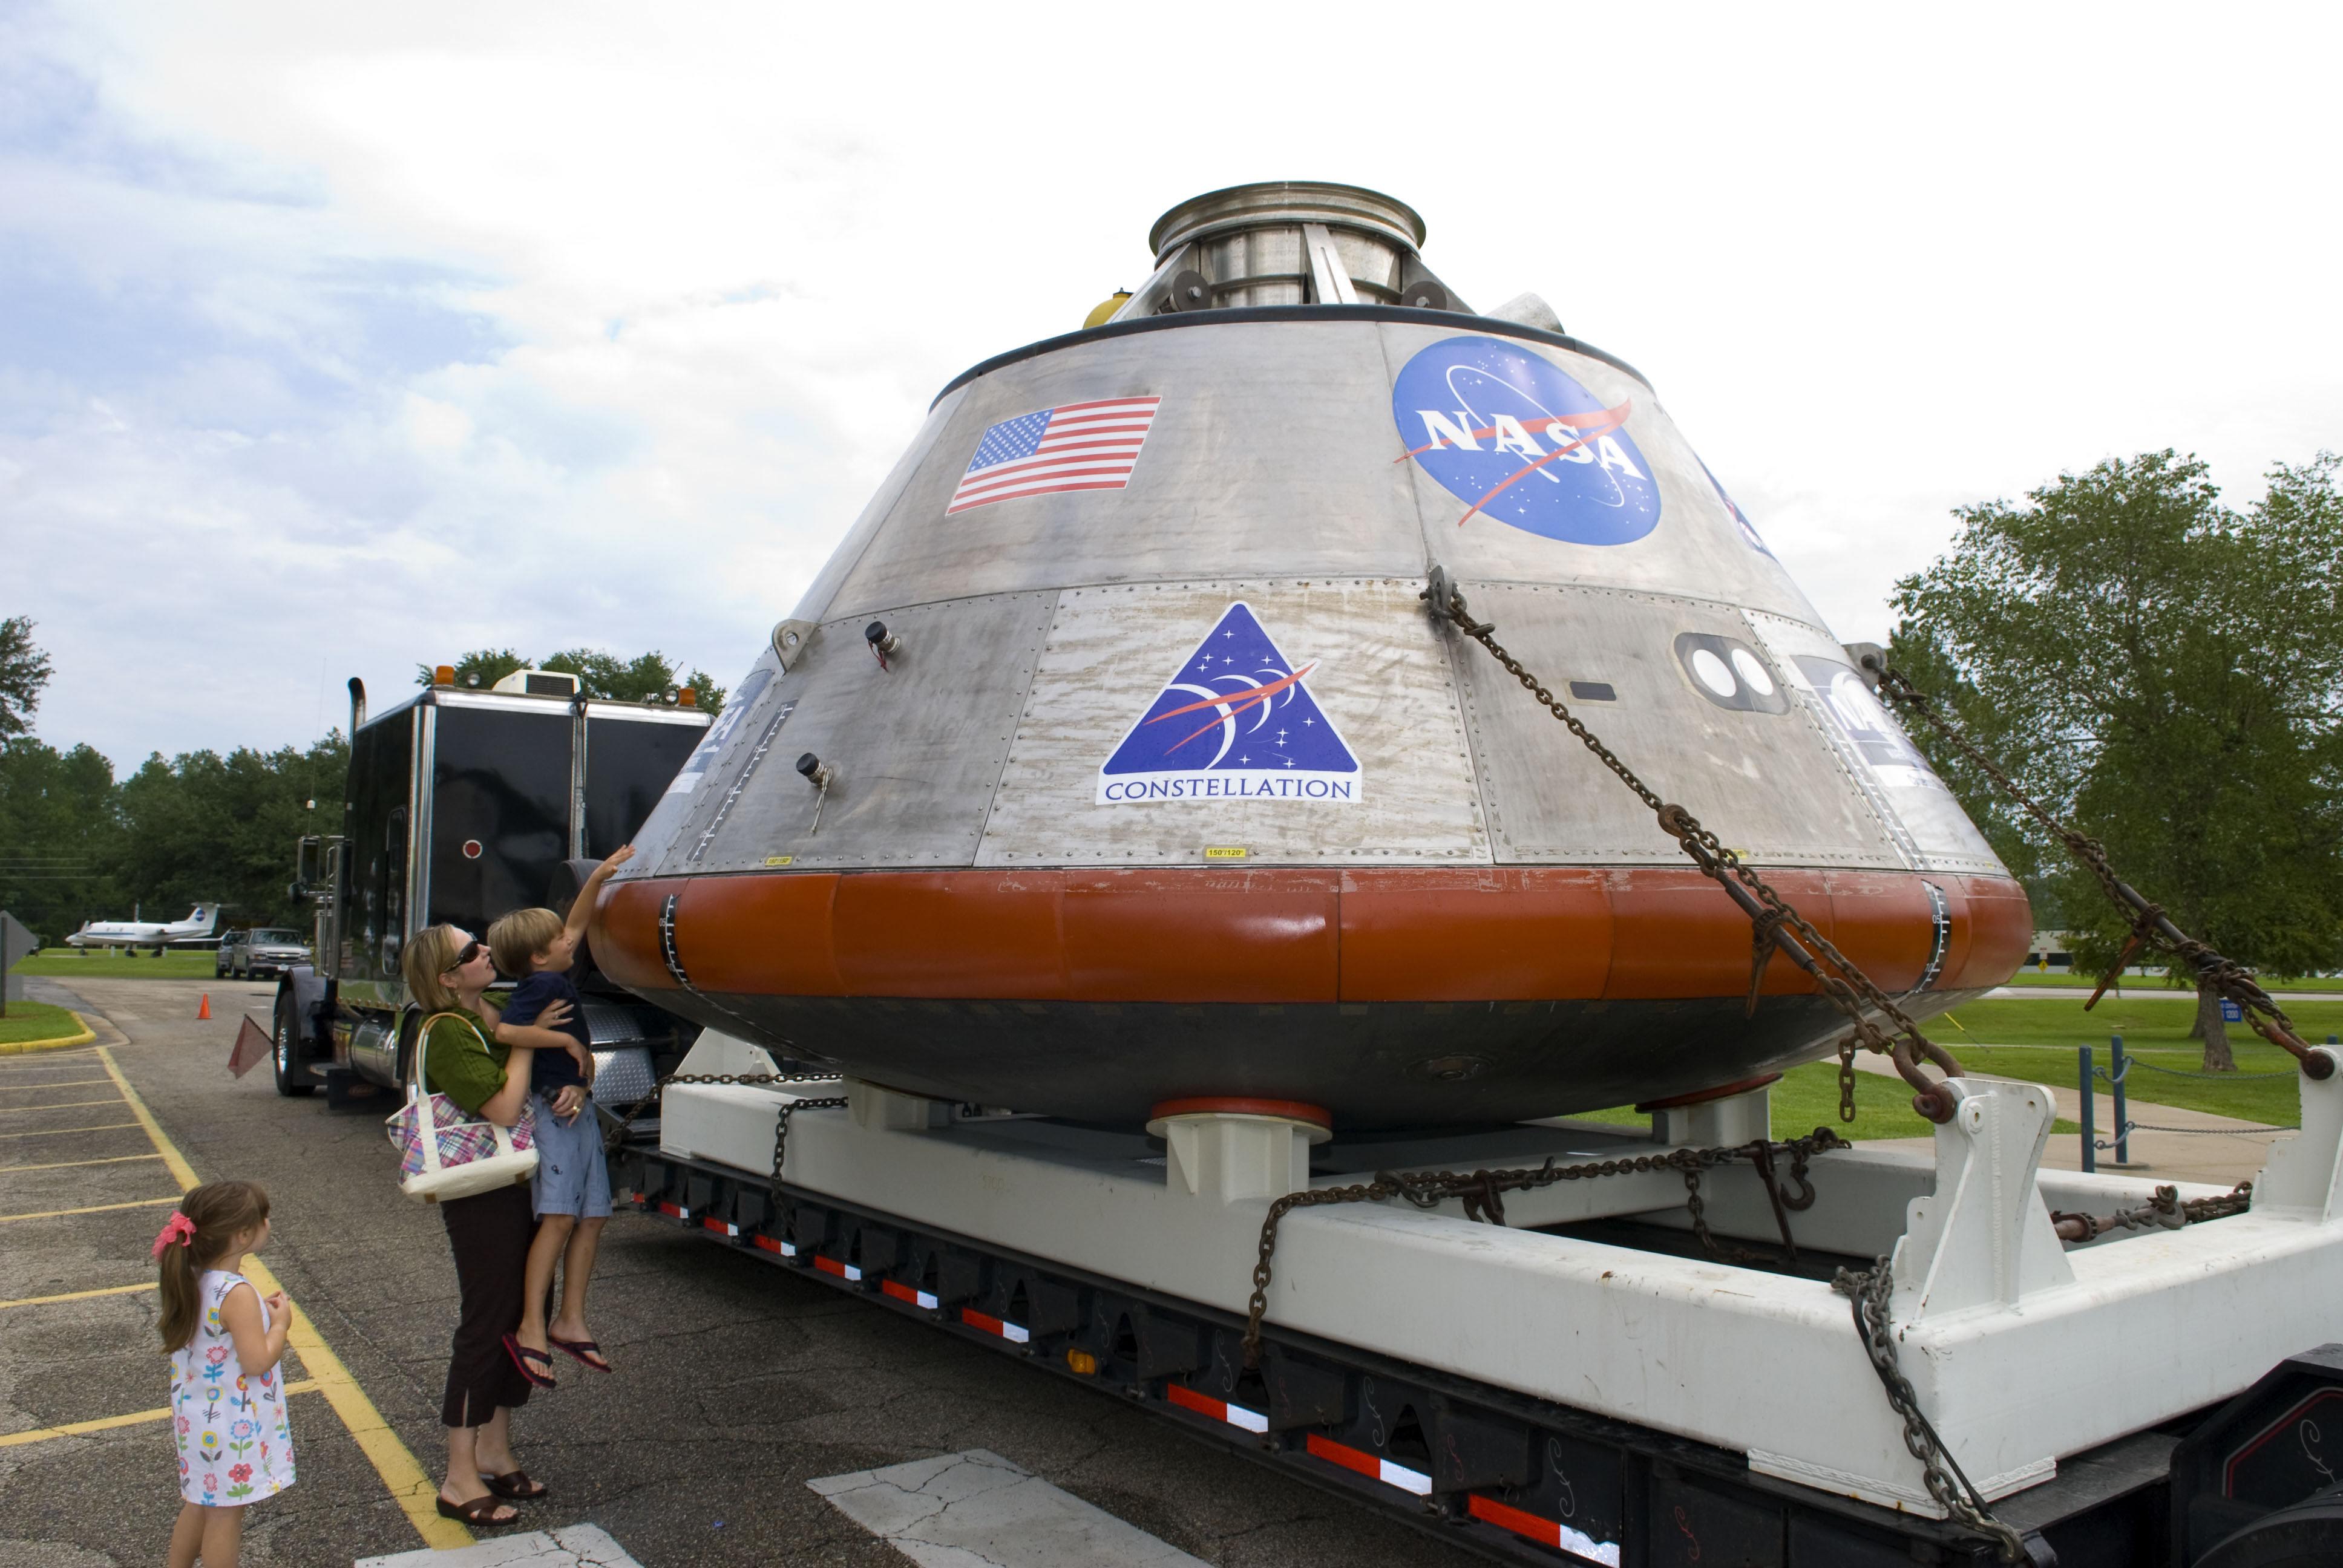 nasa crew transfer vehicle - photo #27